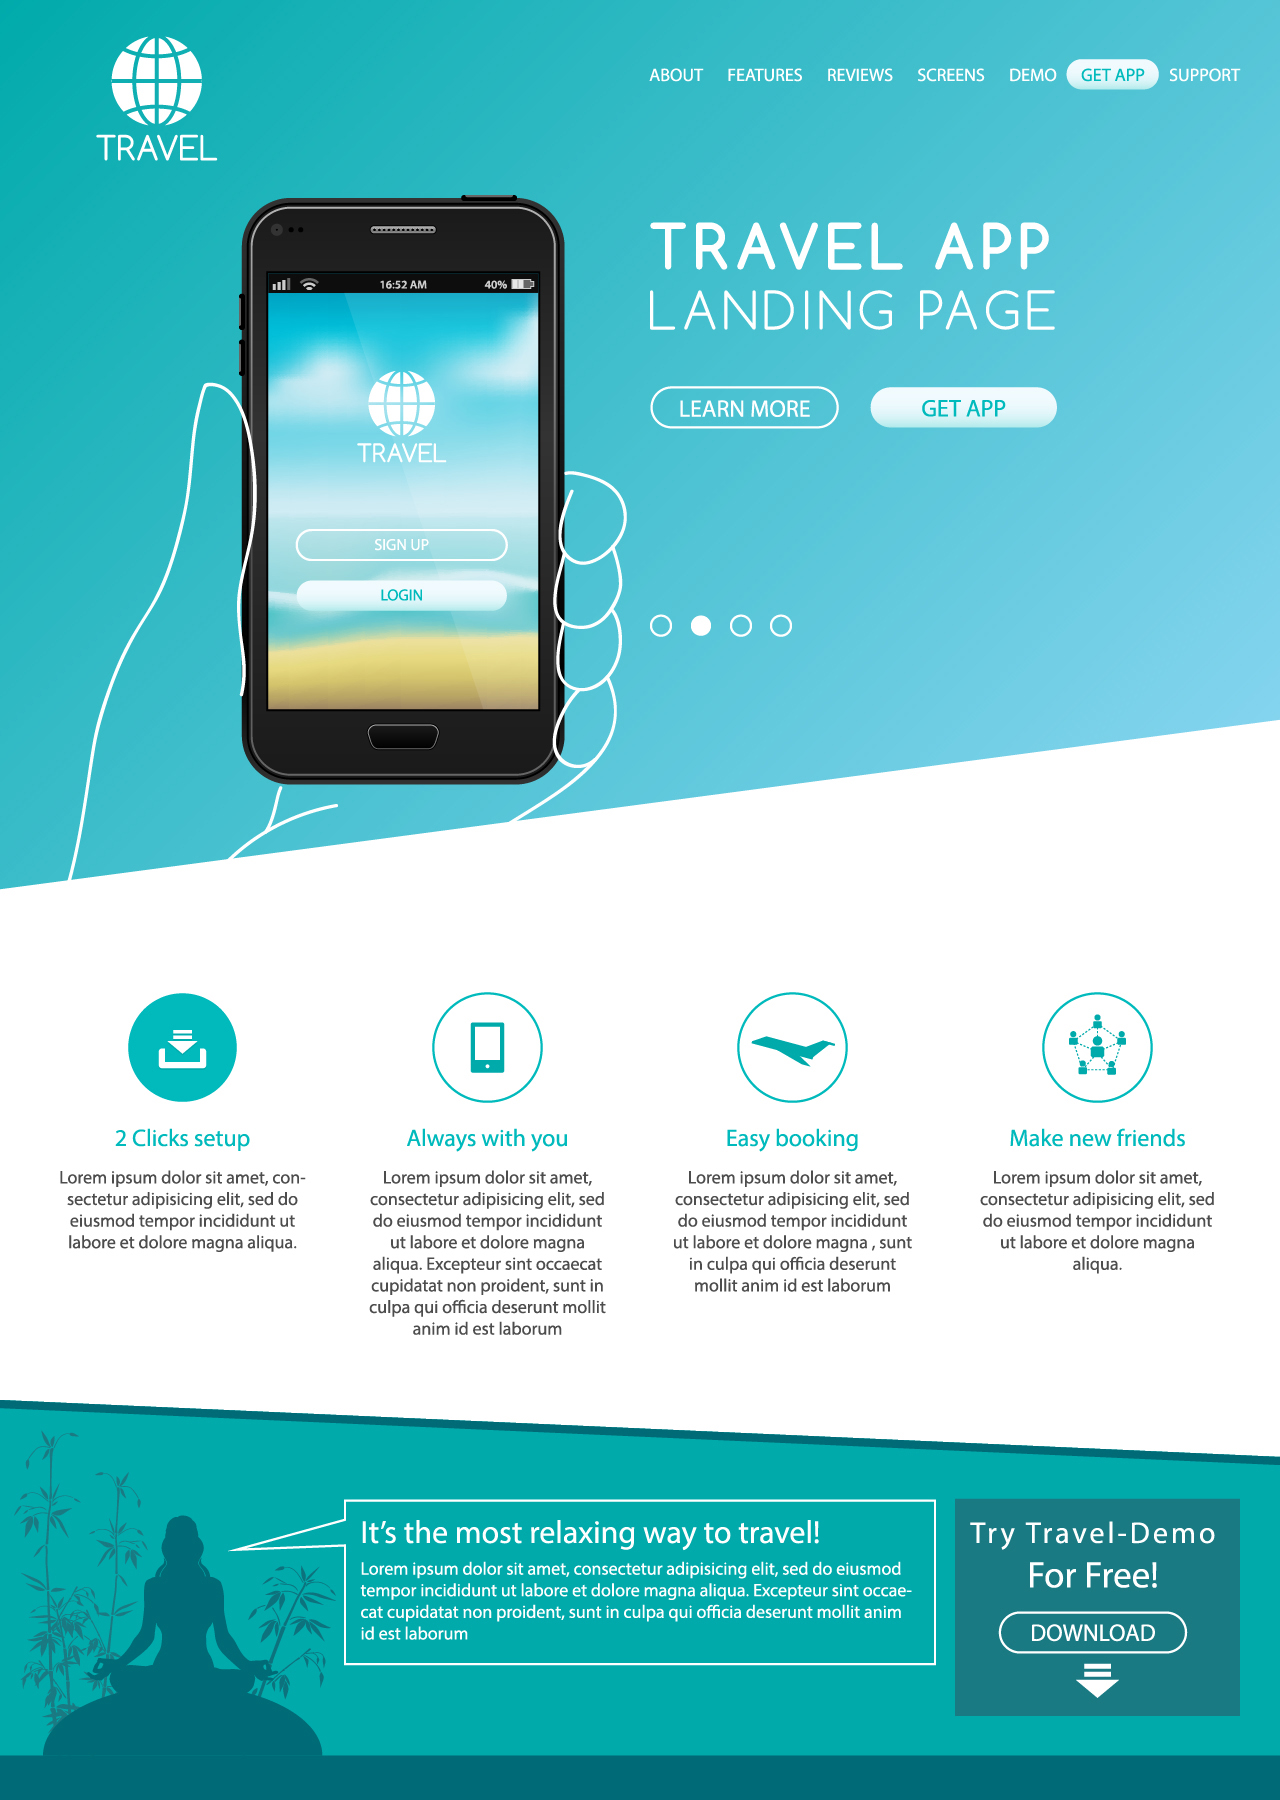 Website landing page mockup layout by Andrei Verner